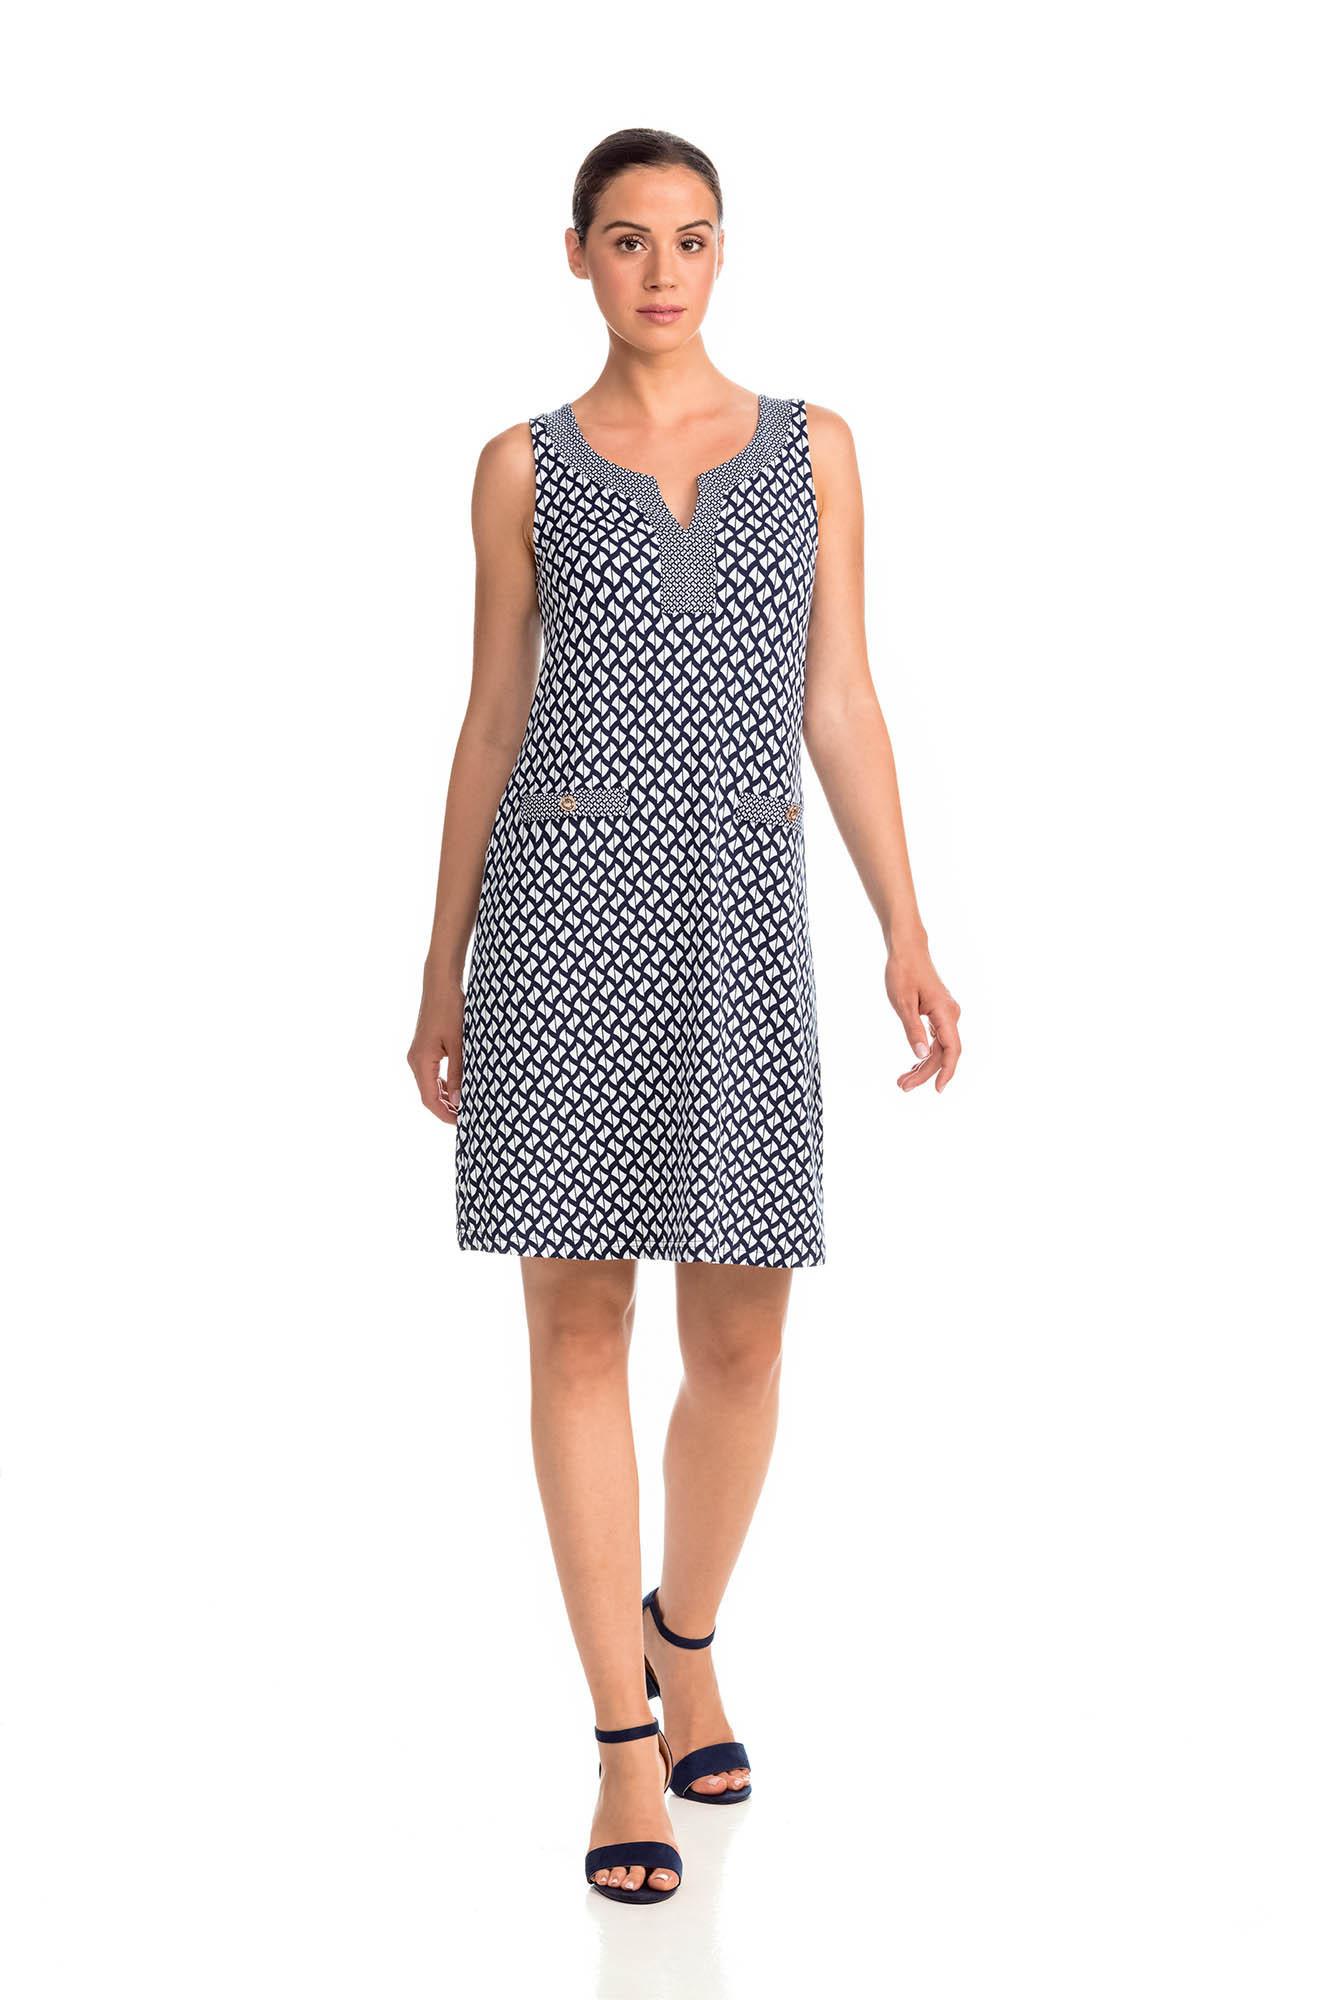 Vamp - Letné dámske šaty 14451 - Vamp blue xl